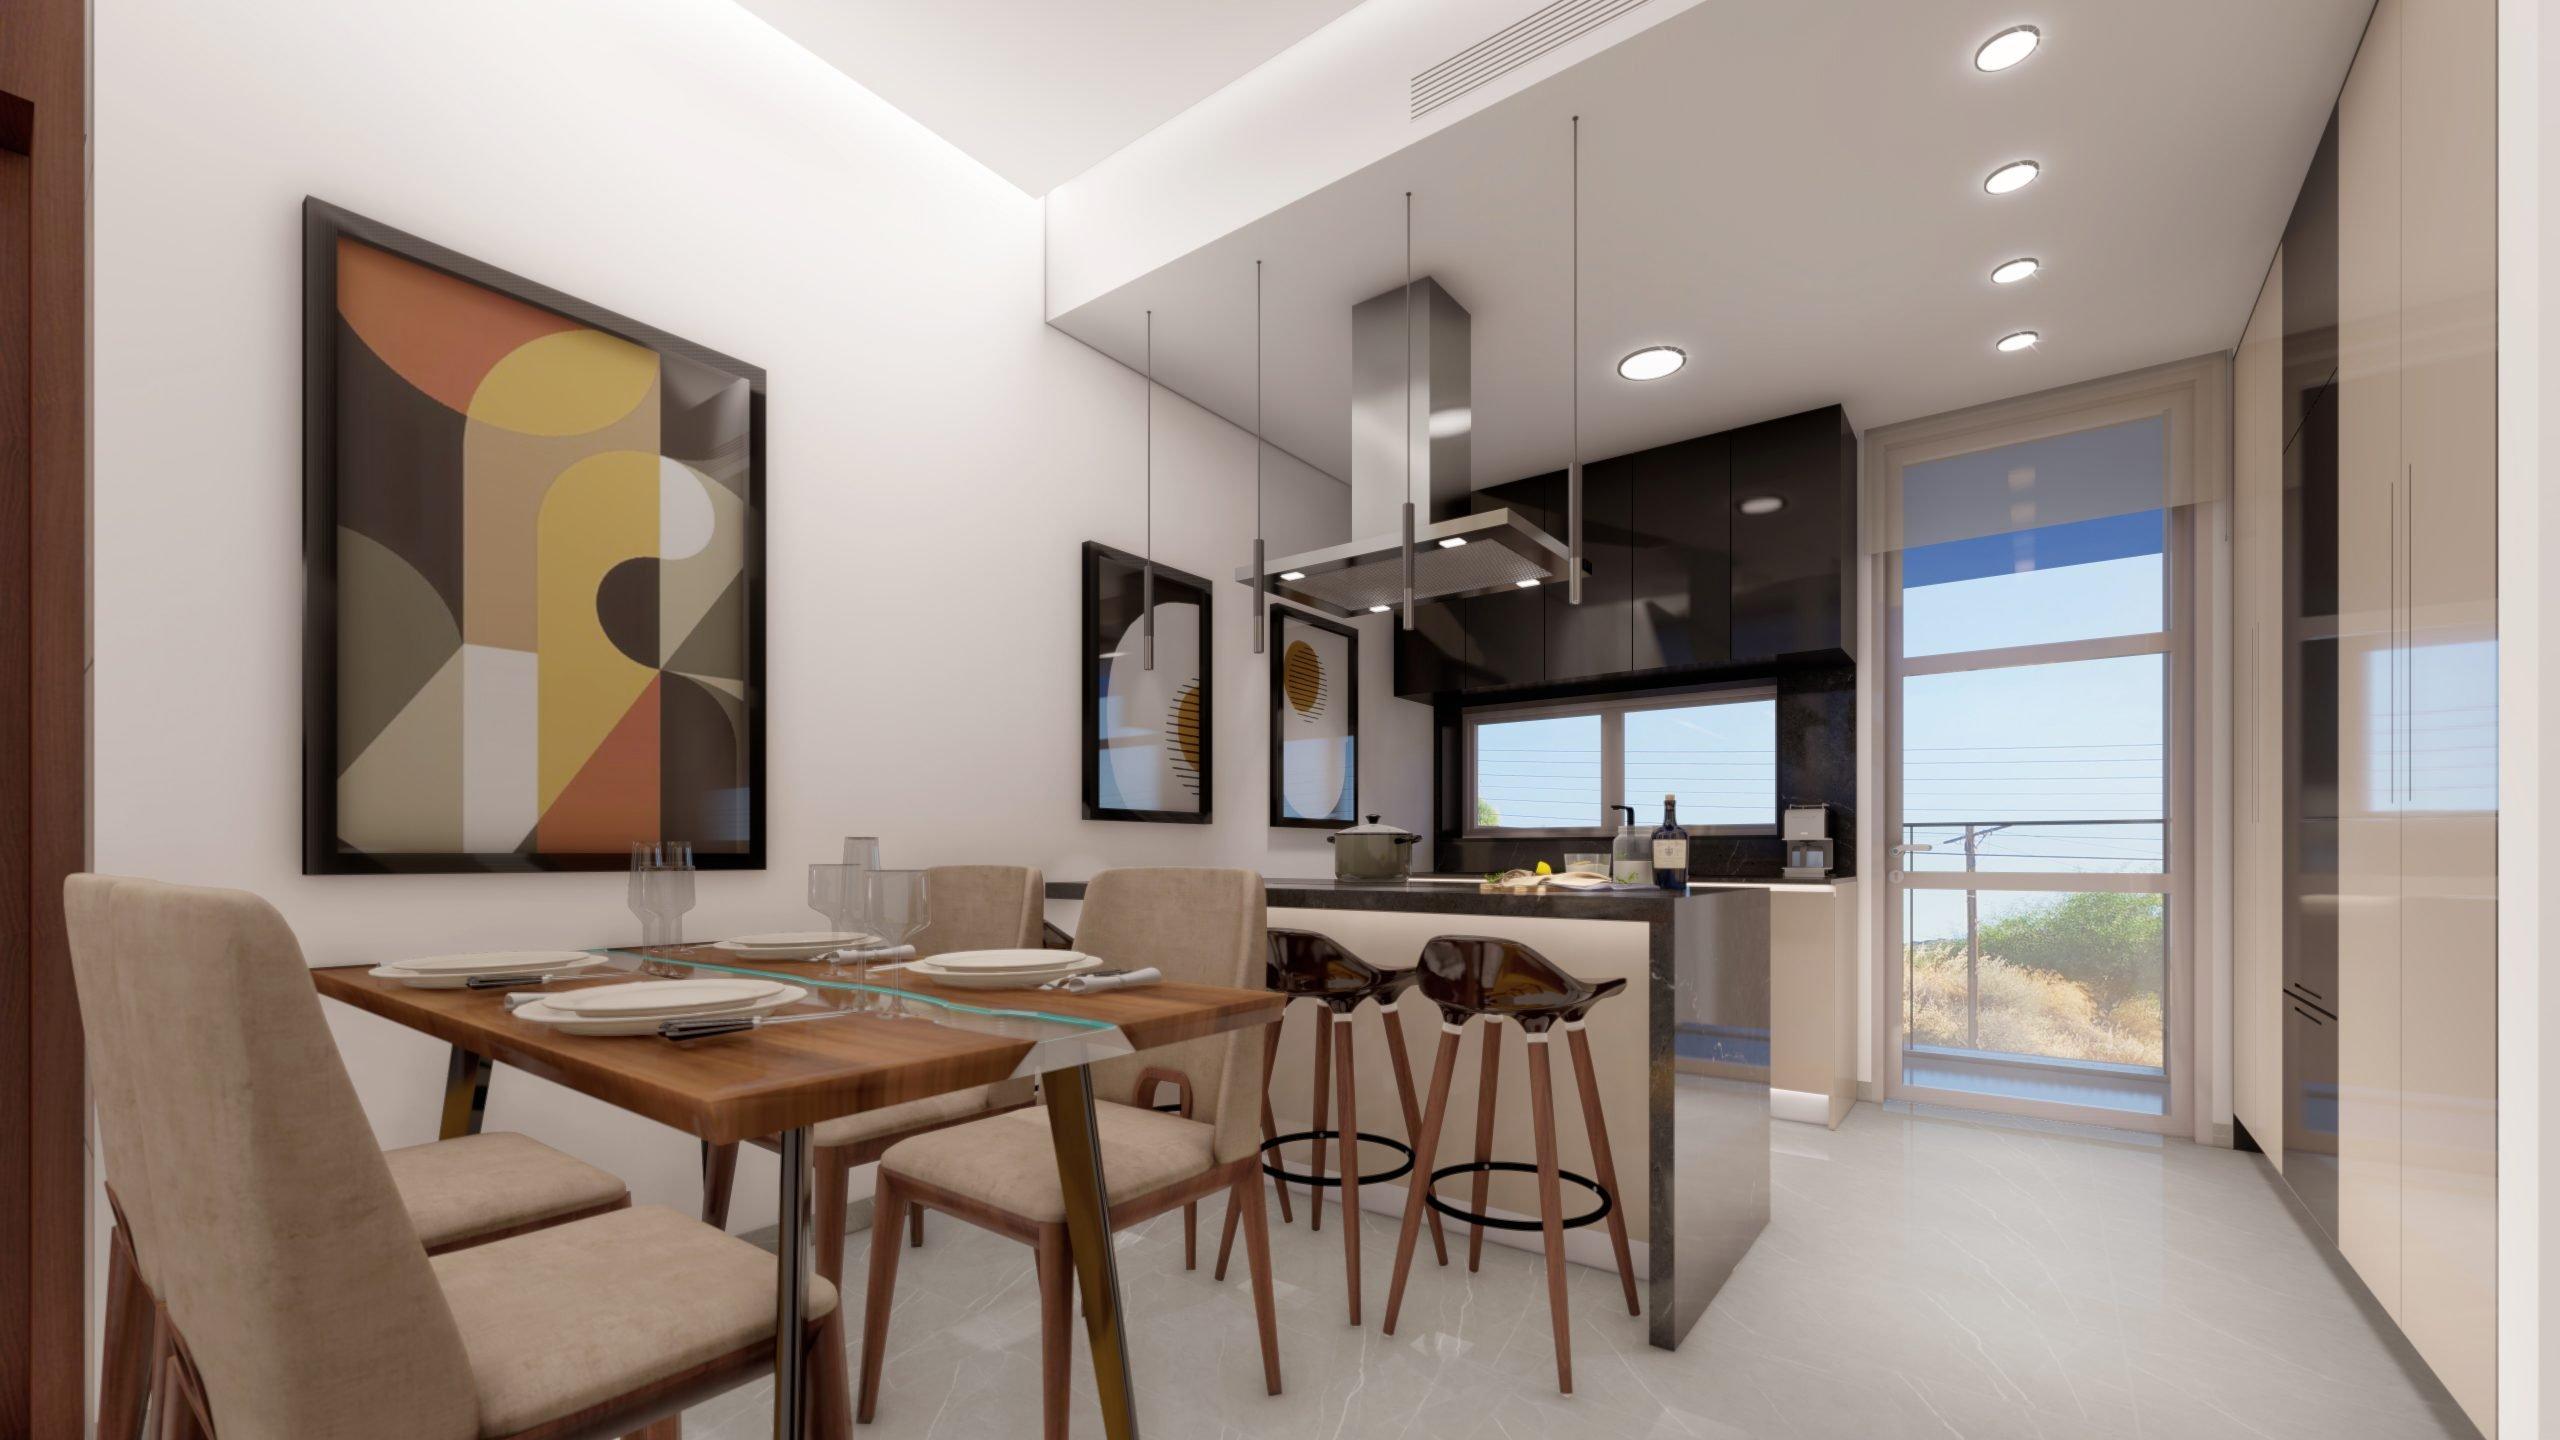 Living Room & Kitchen_4 - Living room & Kitchen